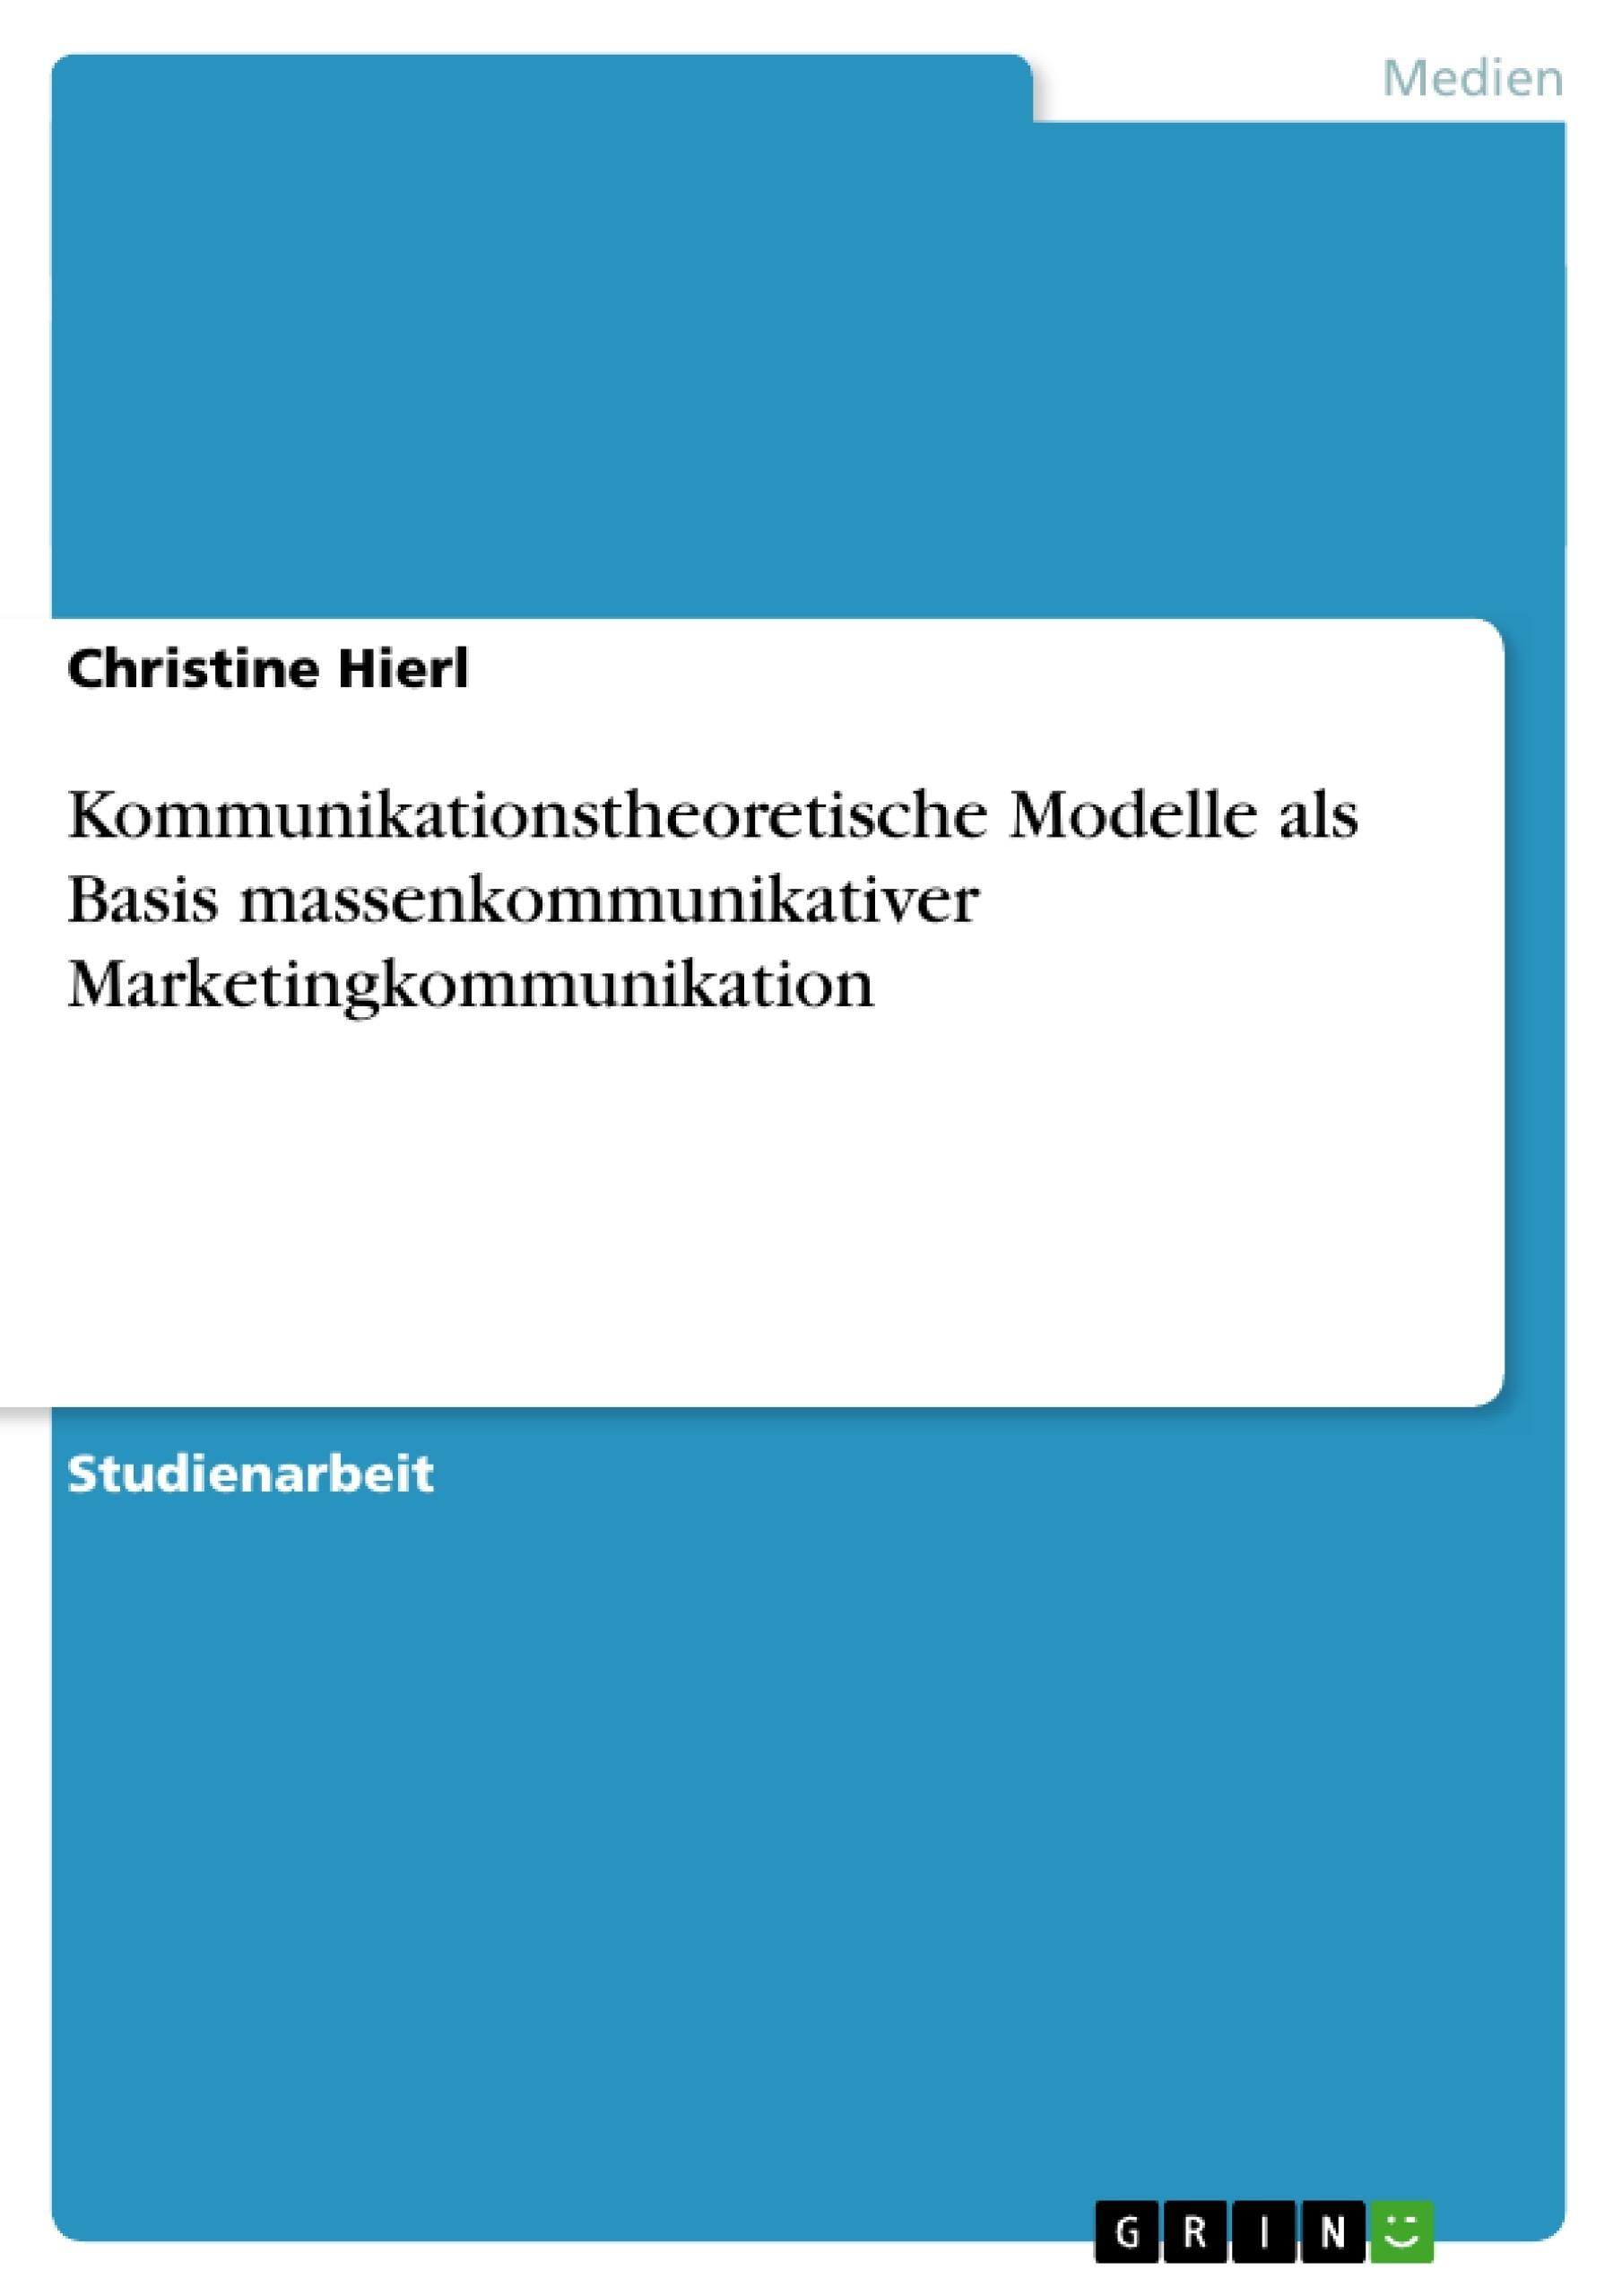 Titel: Kommunikationstheoretische Modelle als Basis massenkommunikativer Marketingkommunikation